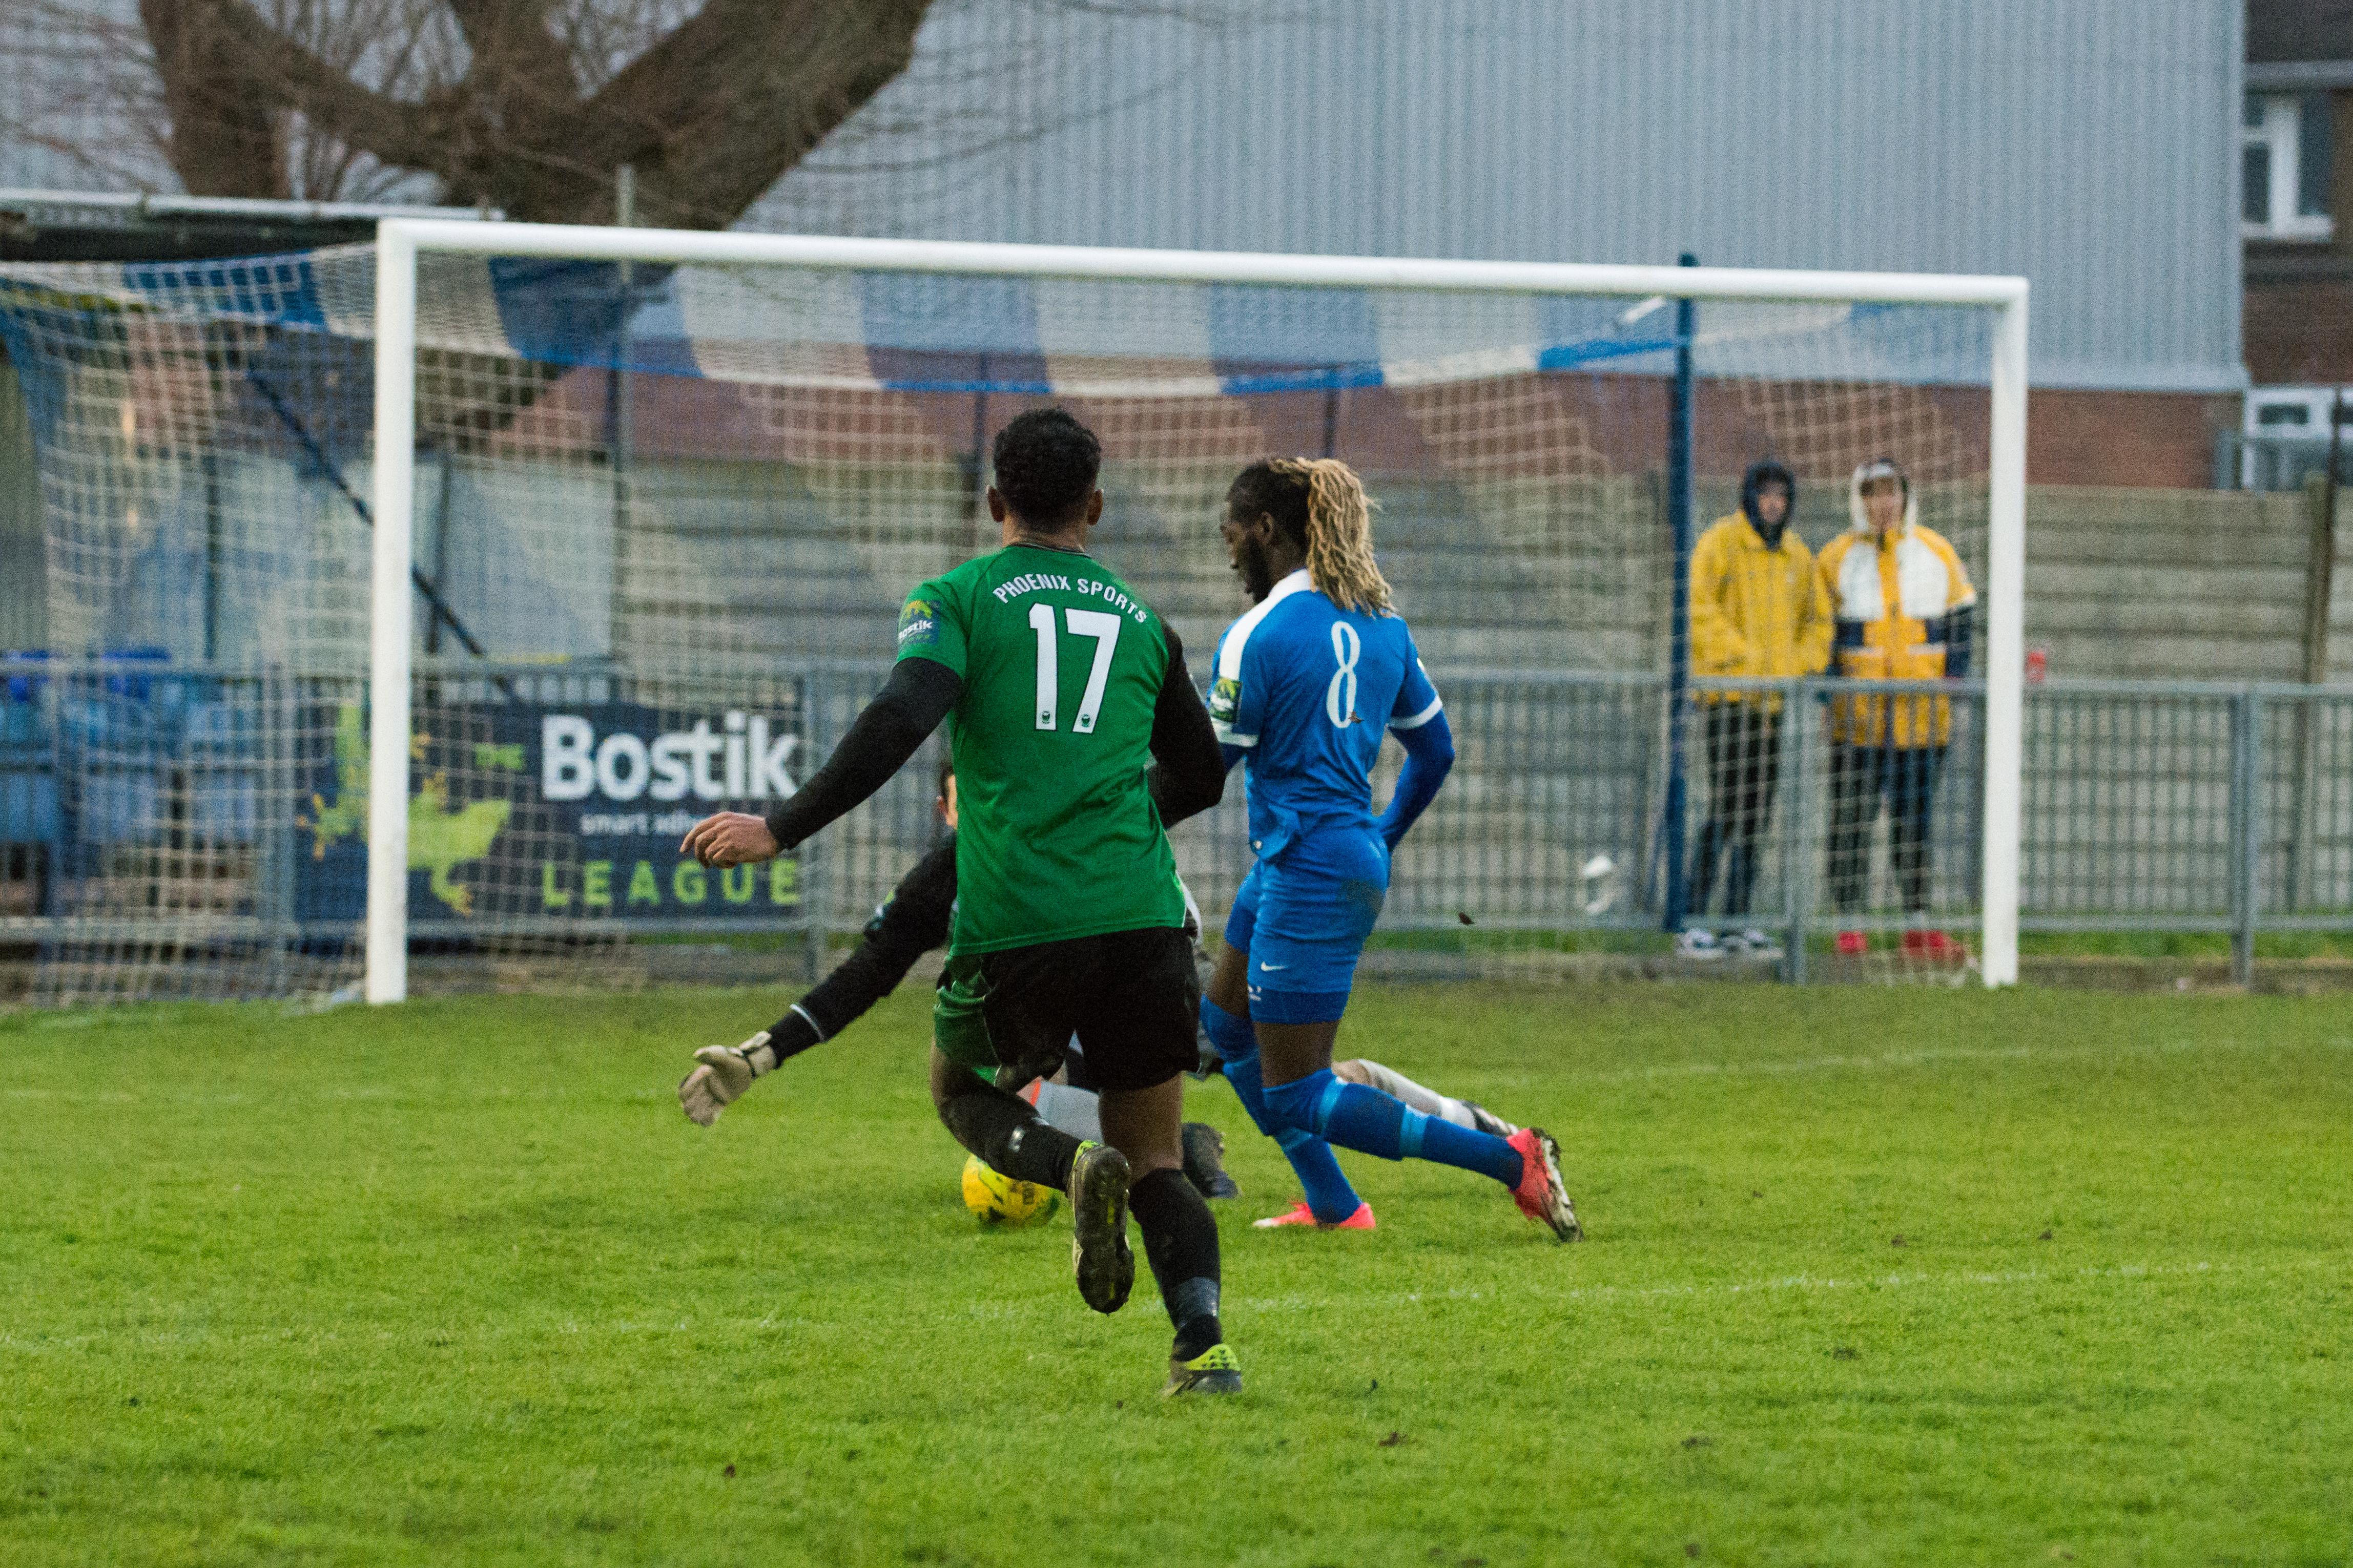 Shoreham FC vs Phoenix Sports 13.01.18 39